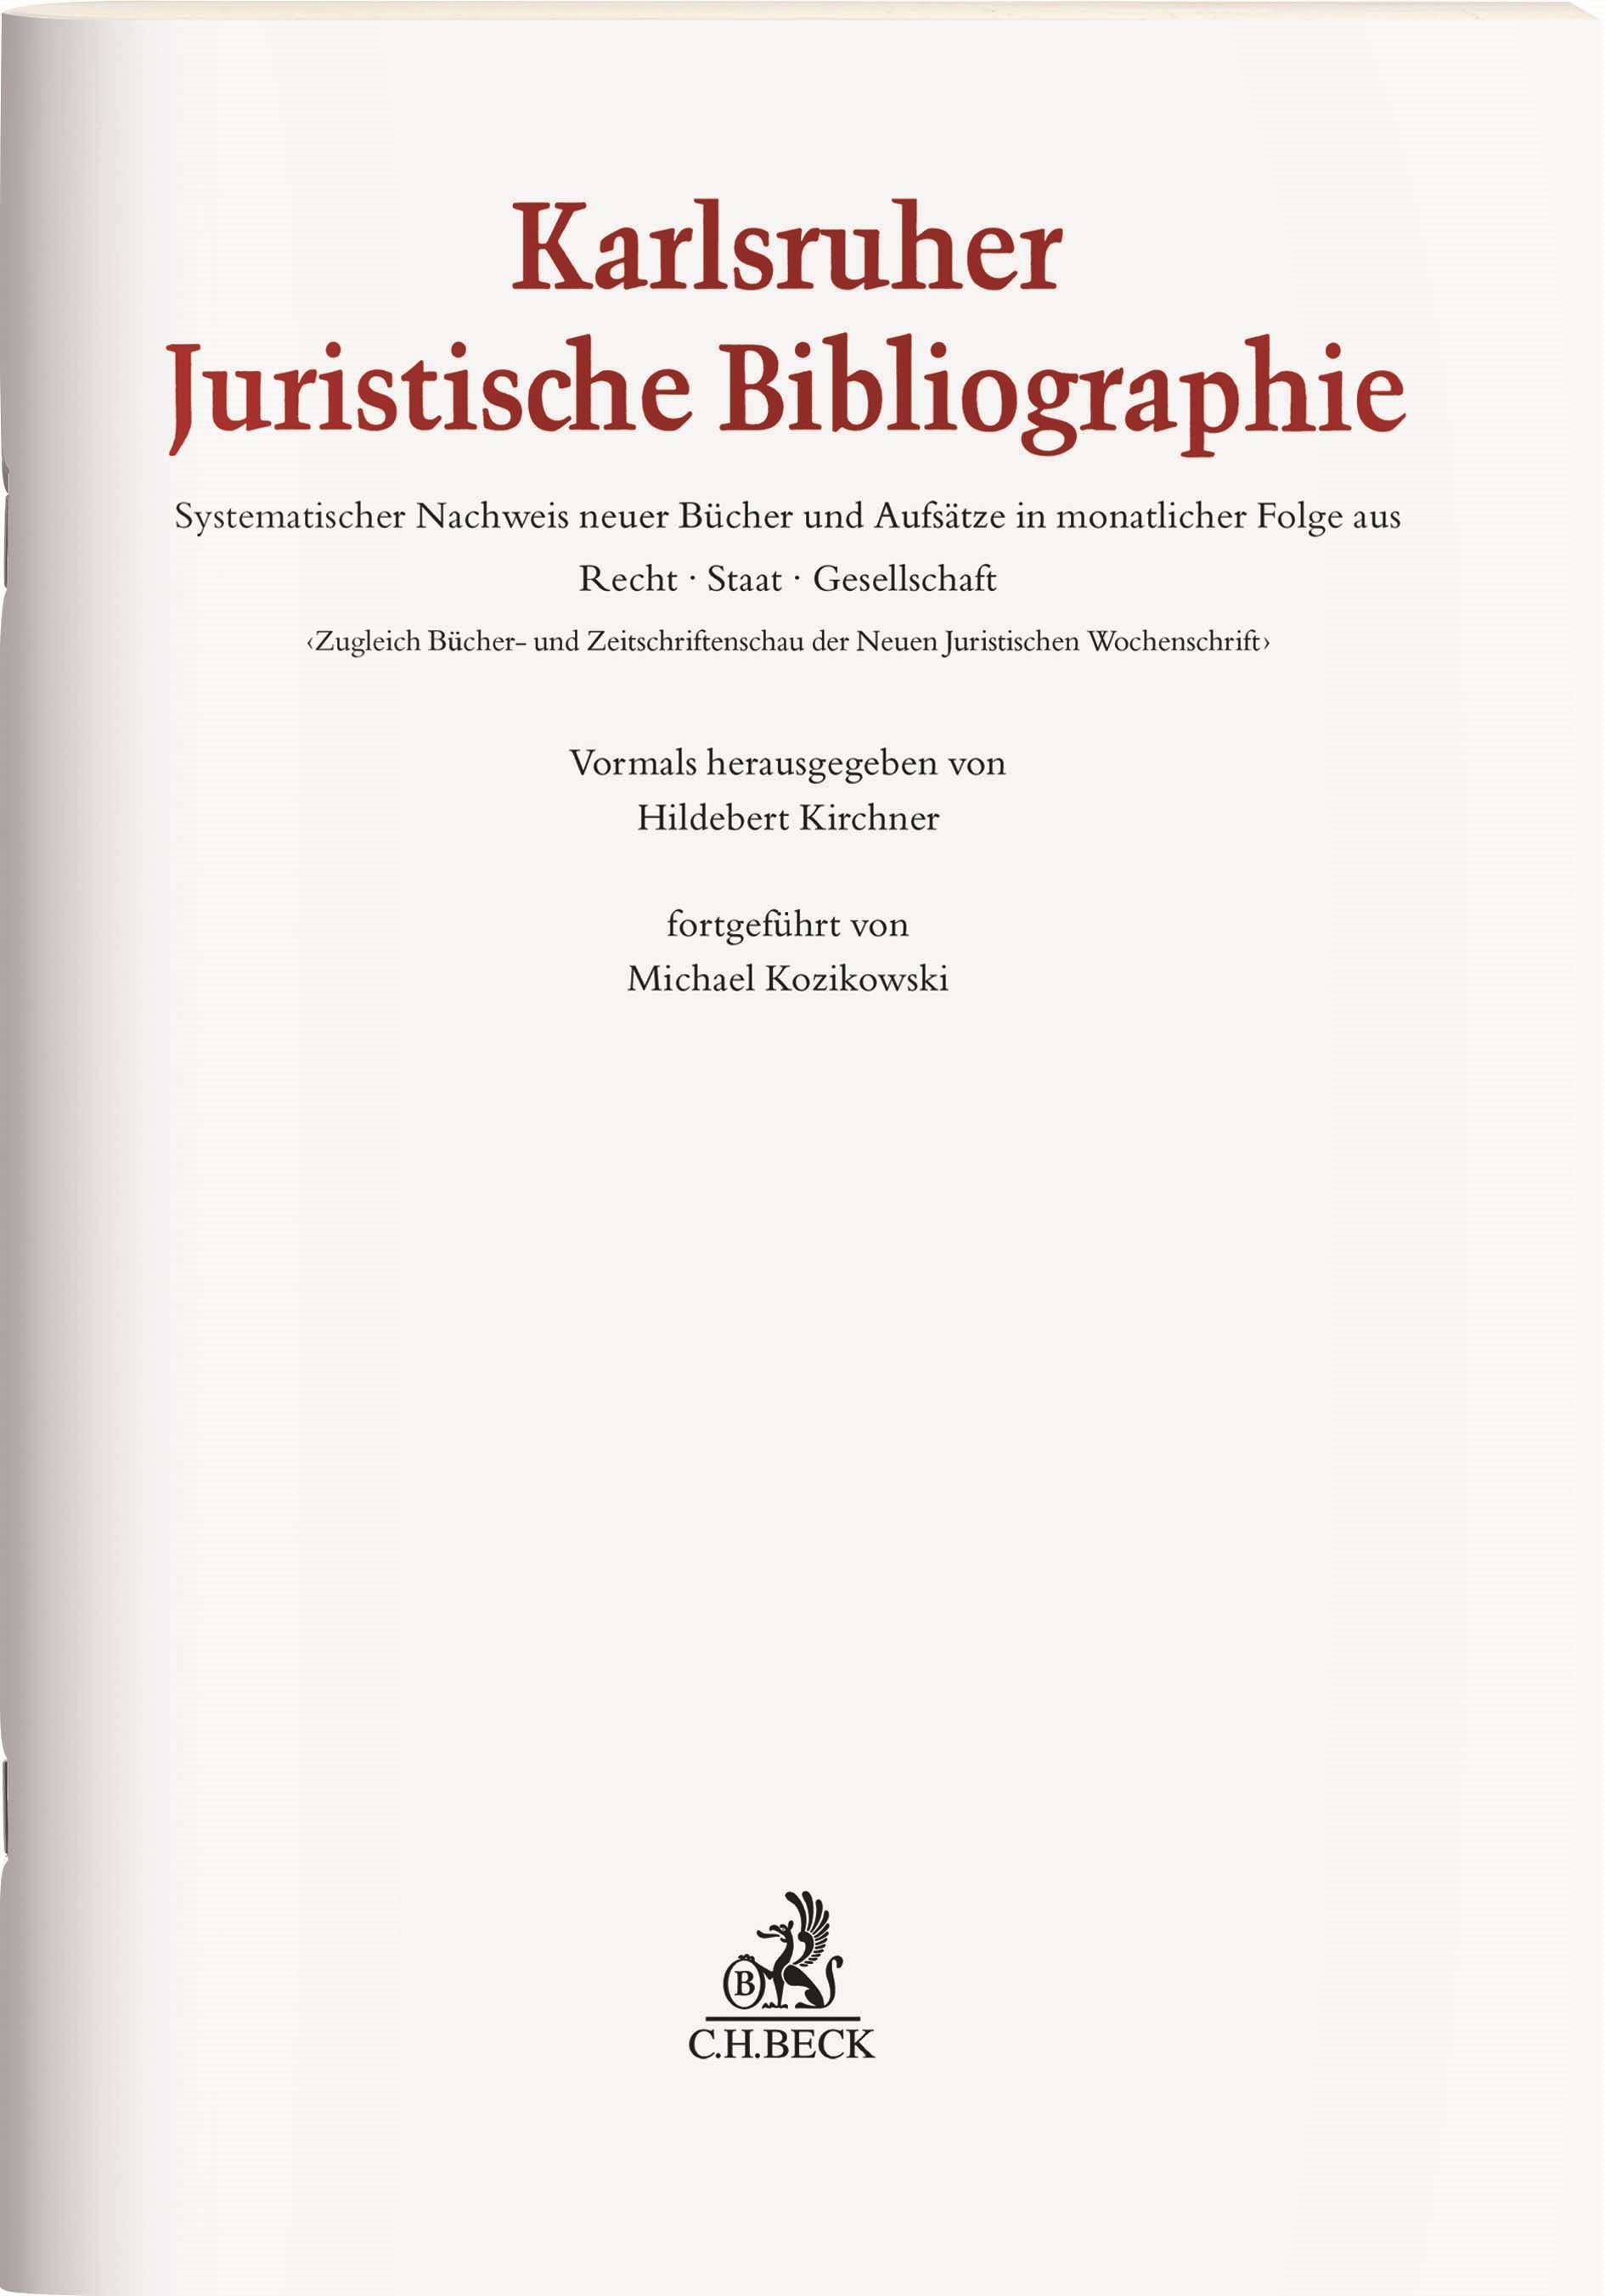 KJB • Karlsruher Juristische Bibliographie | 54. Jahrgang (Cover)